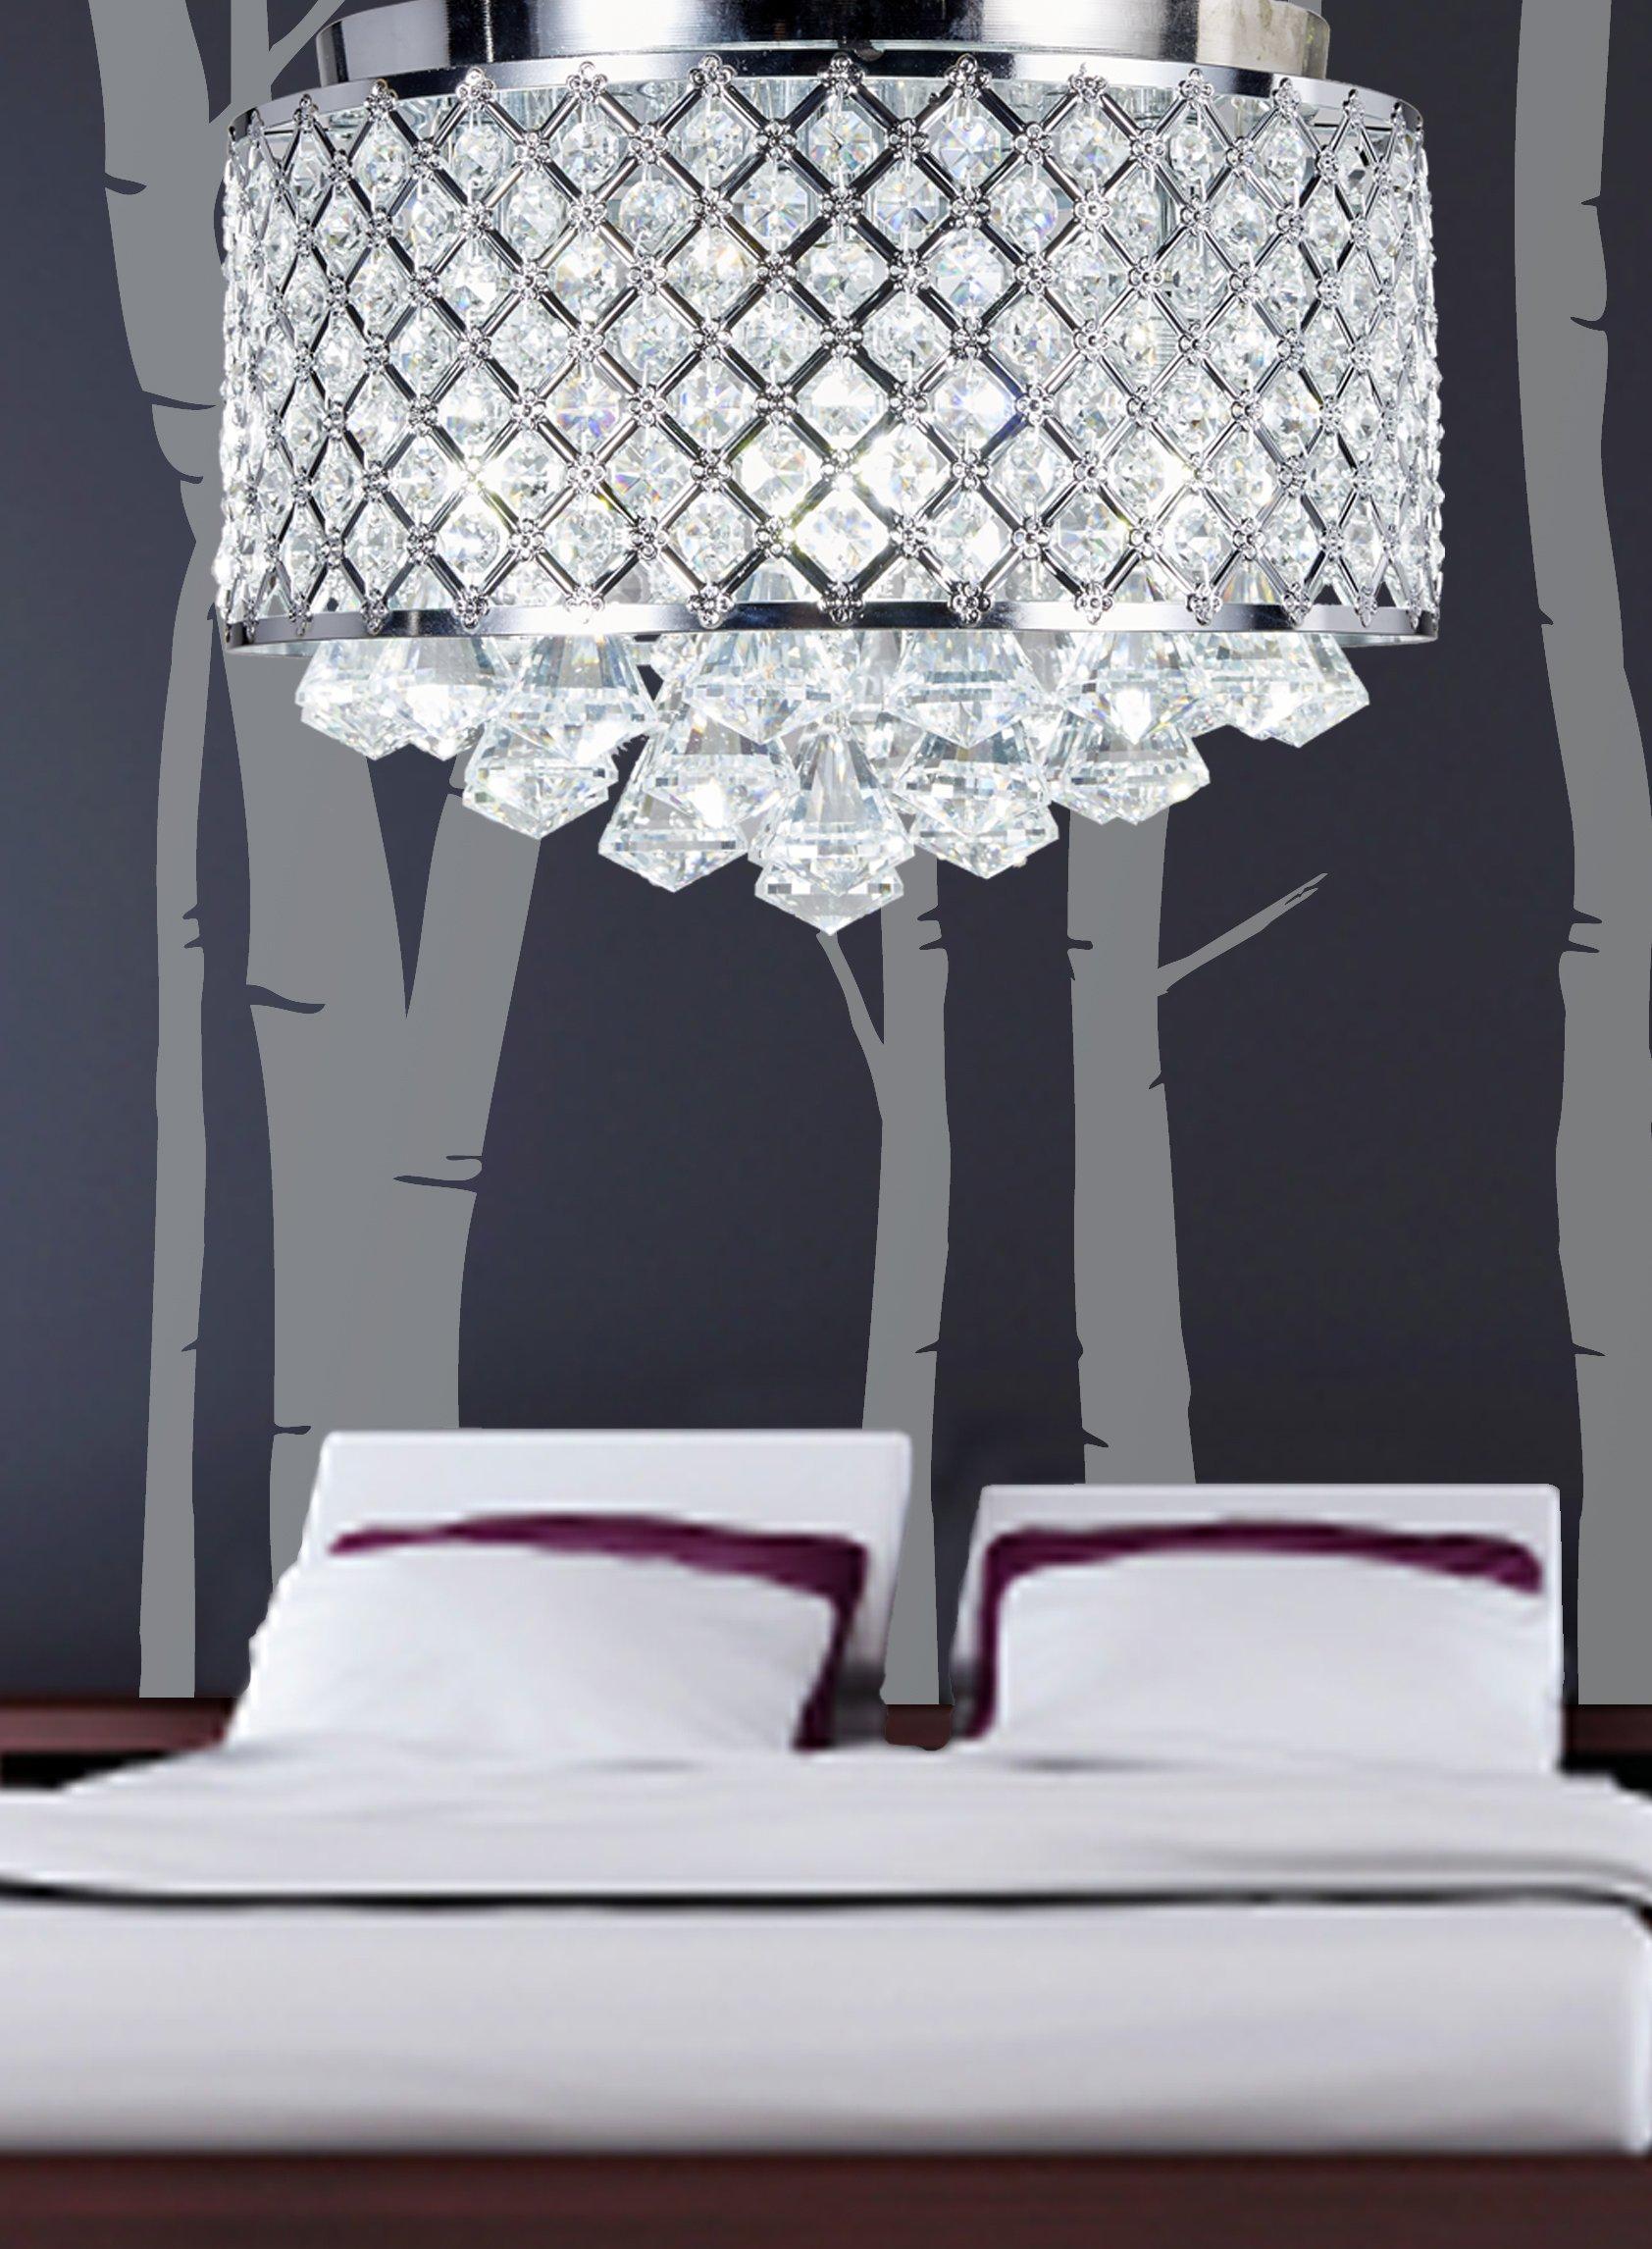 Diamond Life 4-light Chrome Finish Round Metal Shade Crystal Chandelier Flush Mount Ceiling Fixture